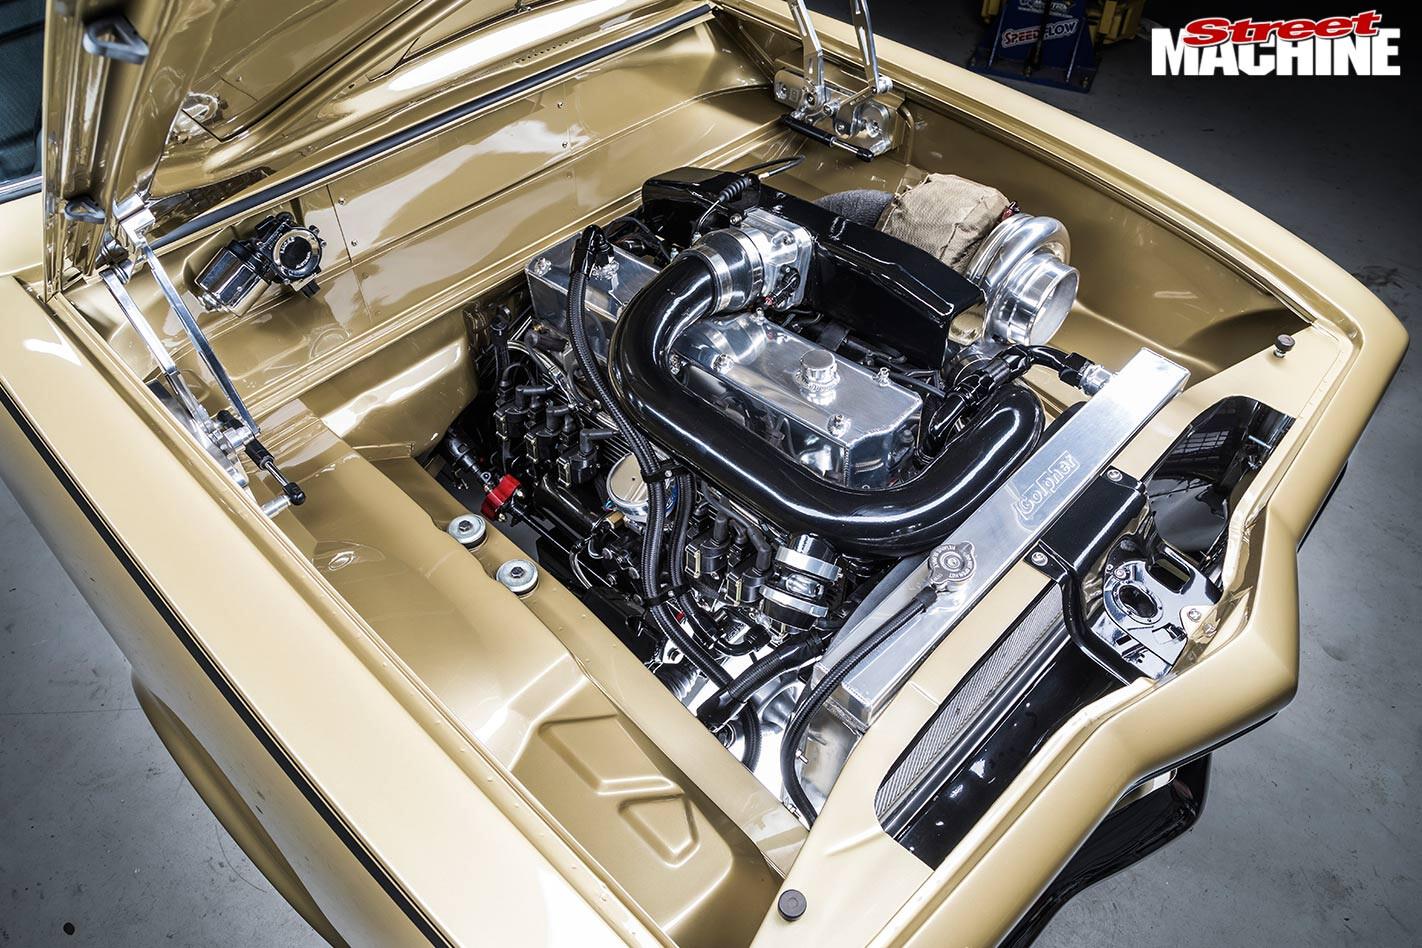 Holden Torana GTR engine bay